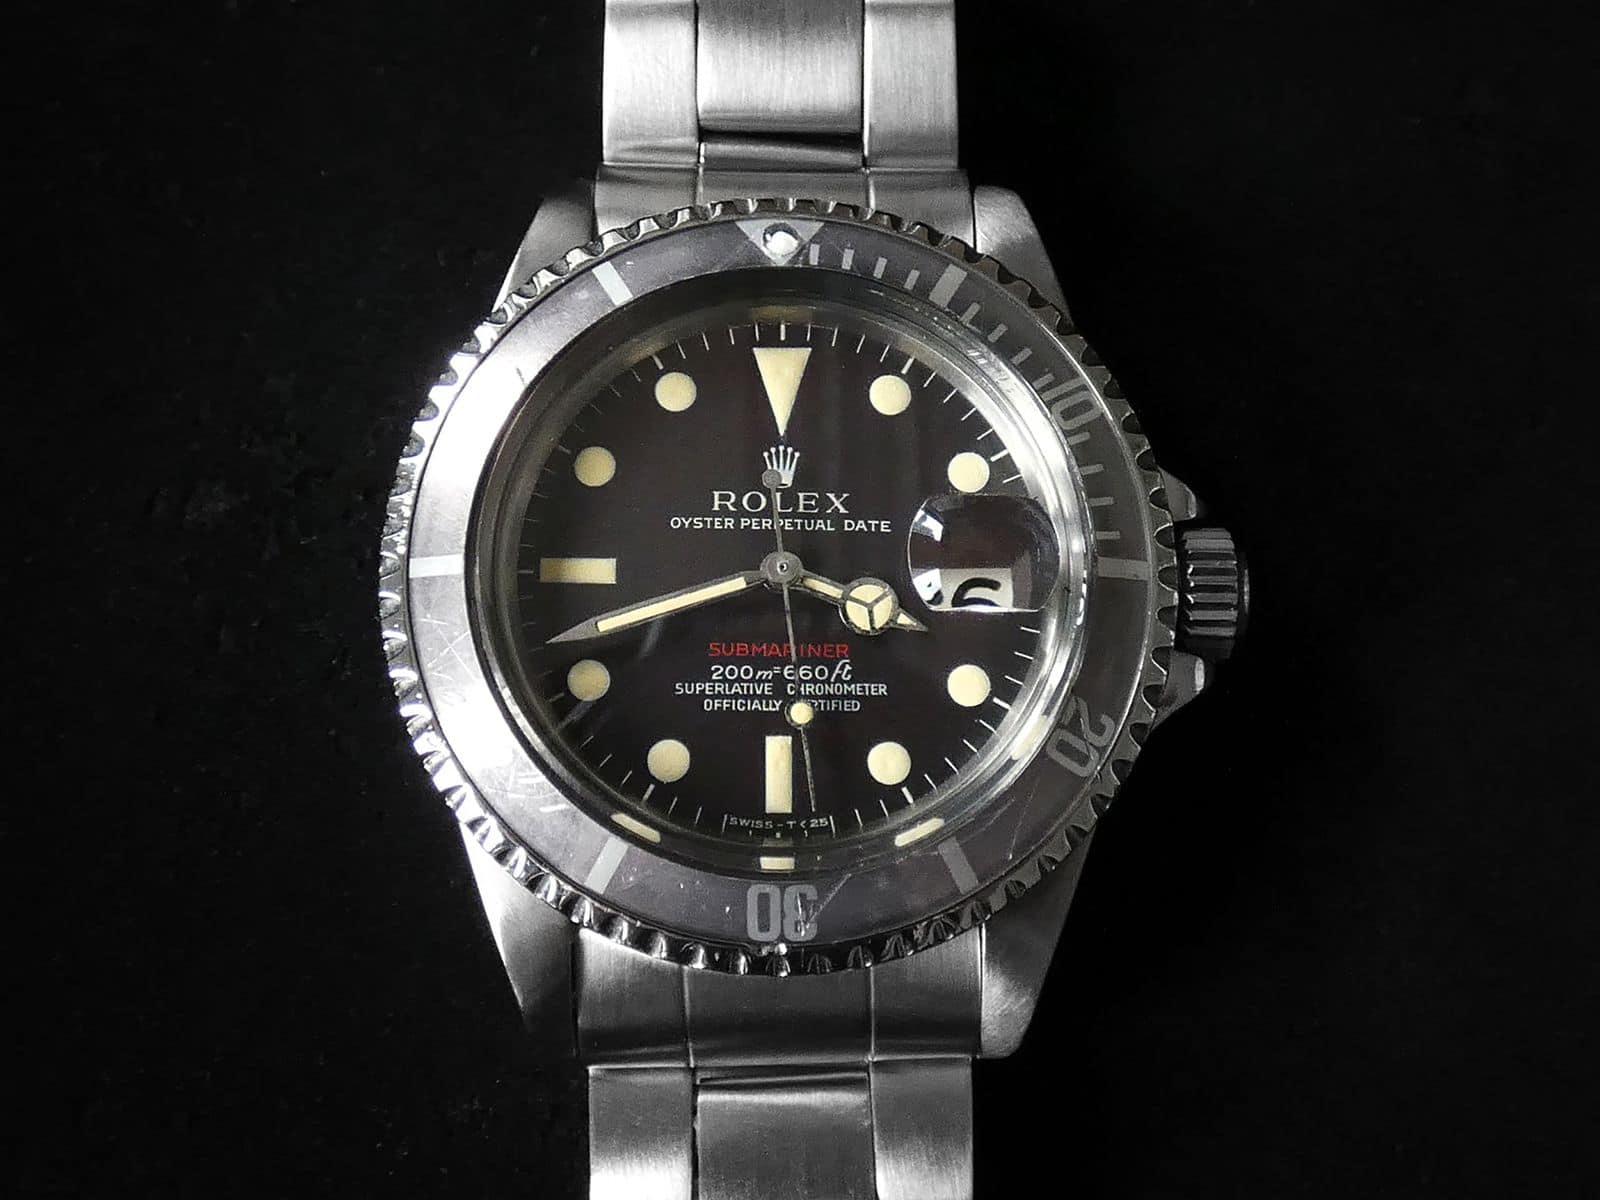 Rolex Red Submariner Ref.1680 〜 Mark I